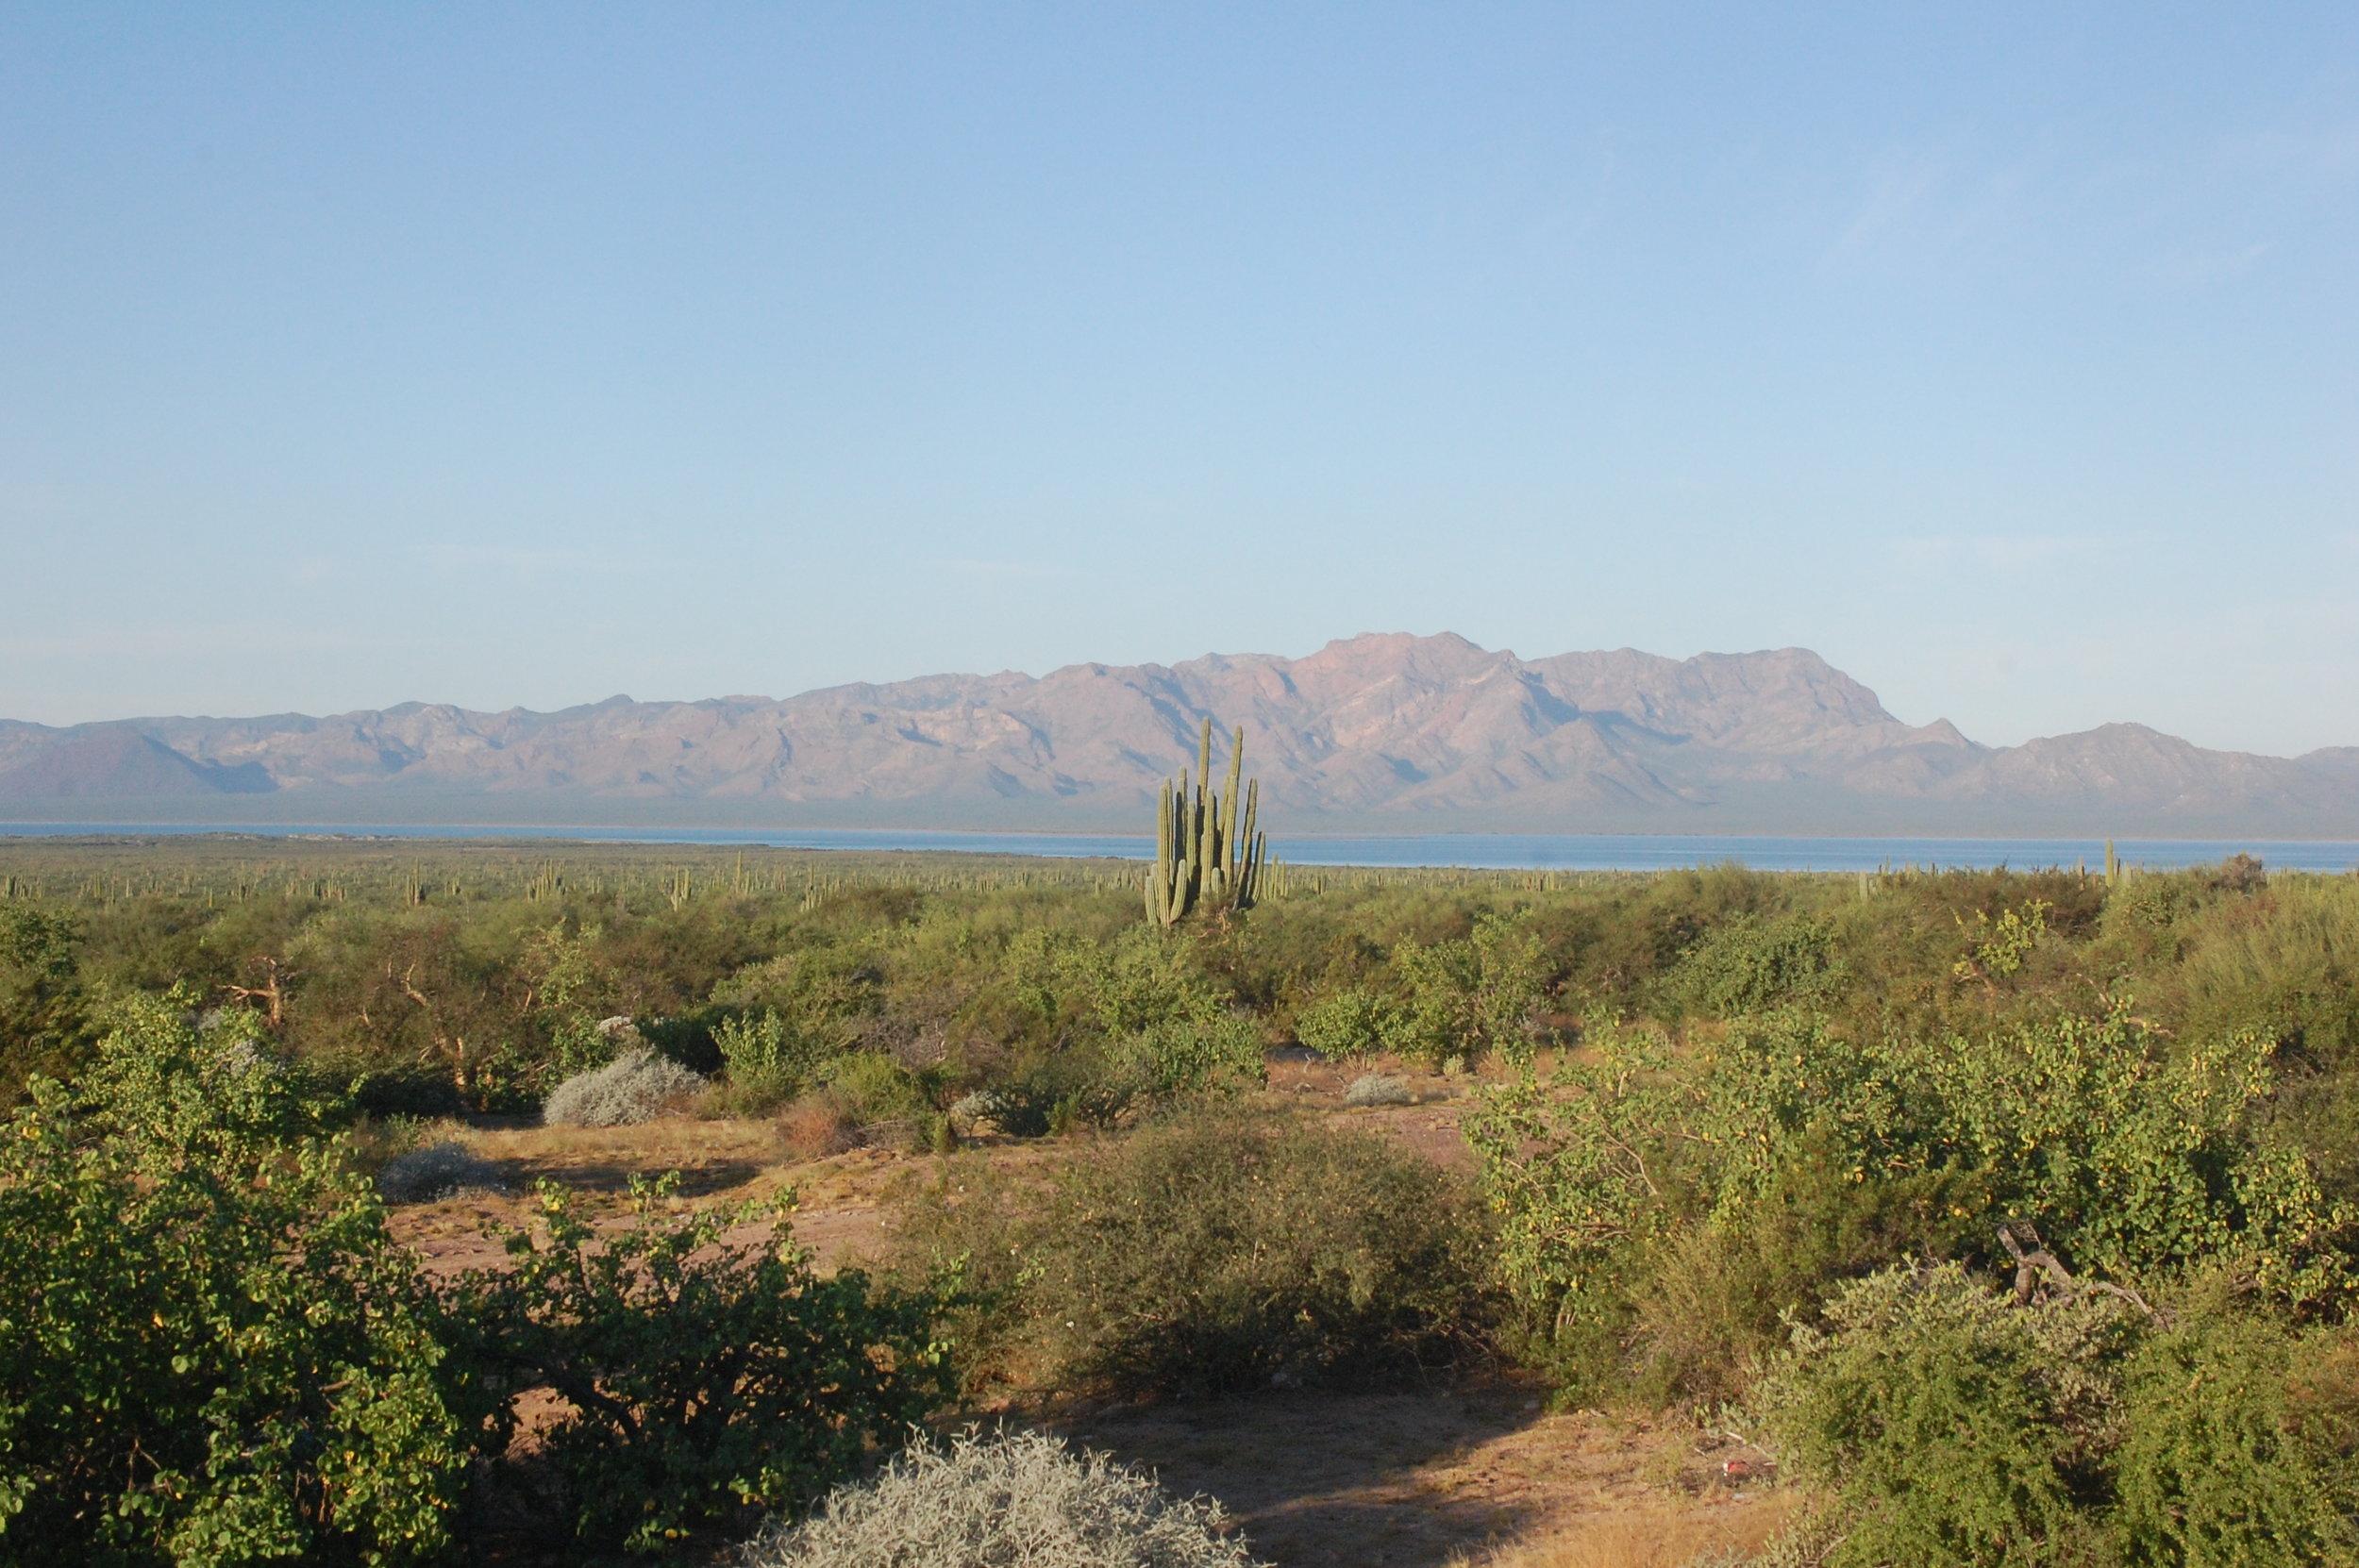 View of Isla Tiburón from the mainland amidst coastal thornscrub vegetation